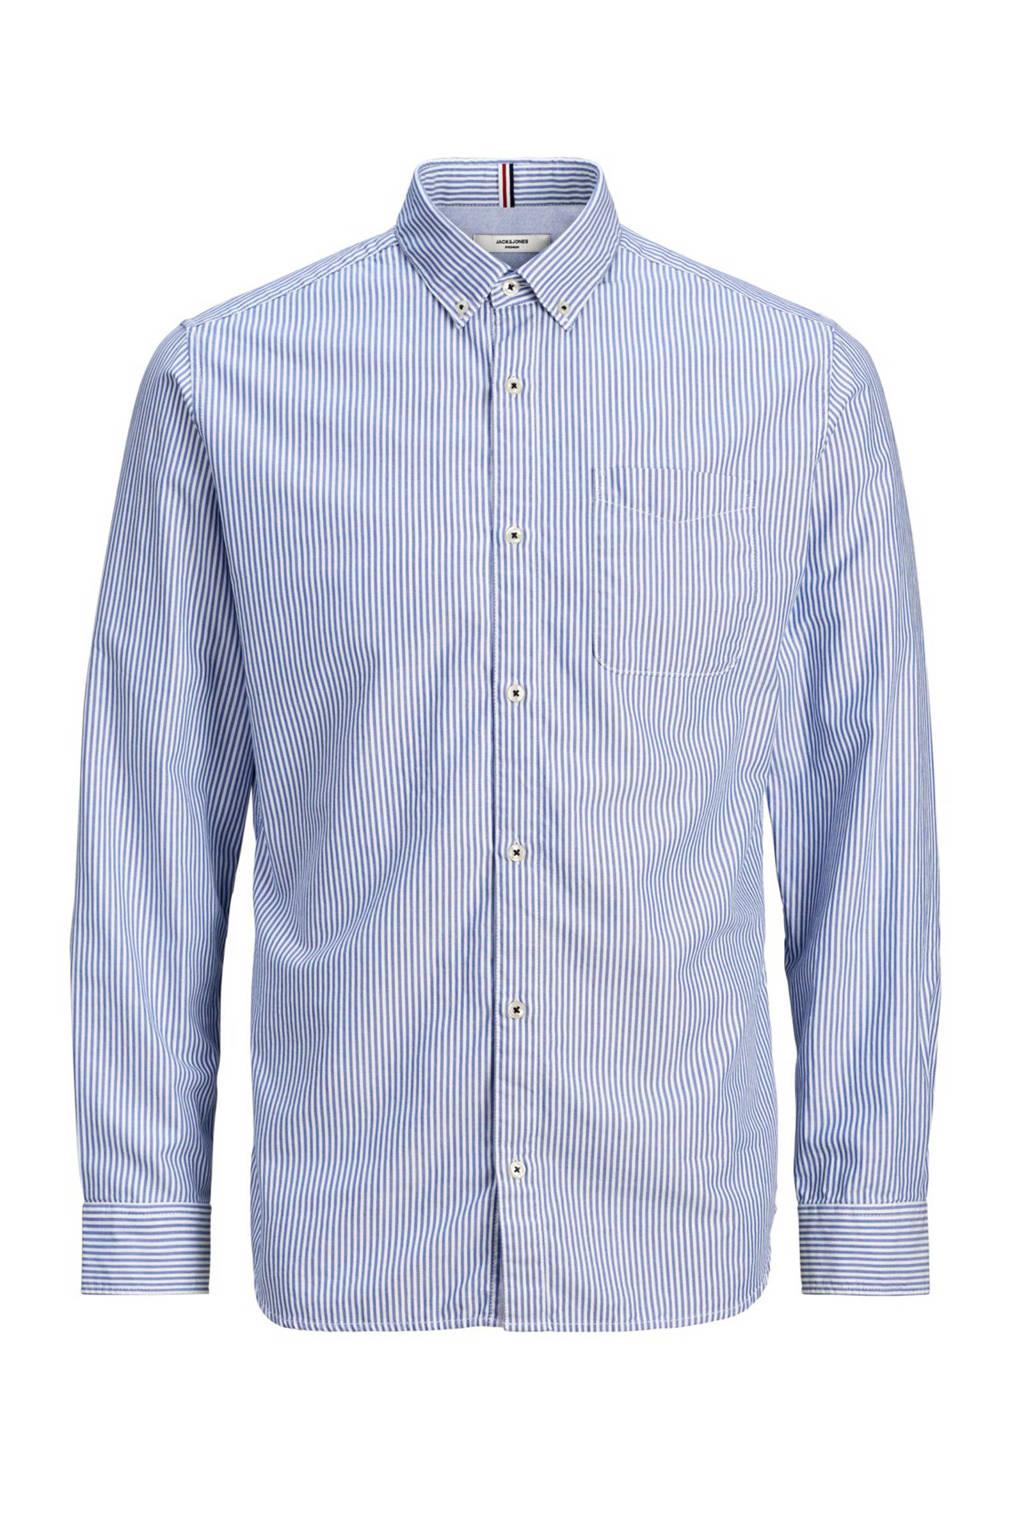 JACK & JONES PREMIUM gestreept slim fit overhemd blauw/wit, Blauw/wit